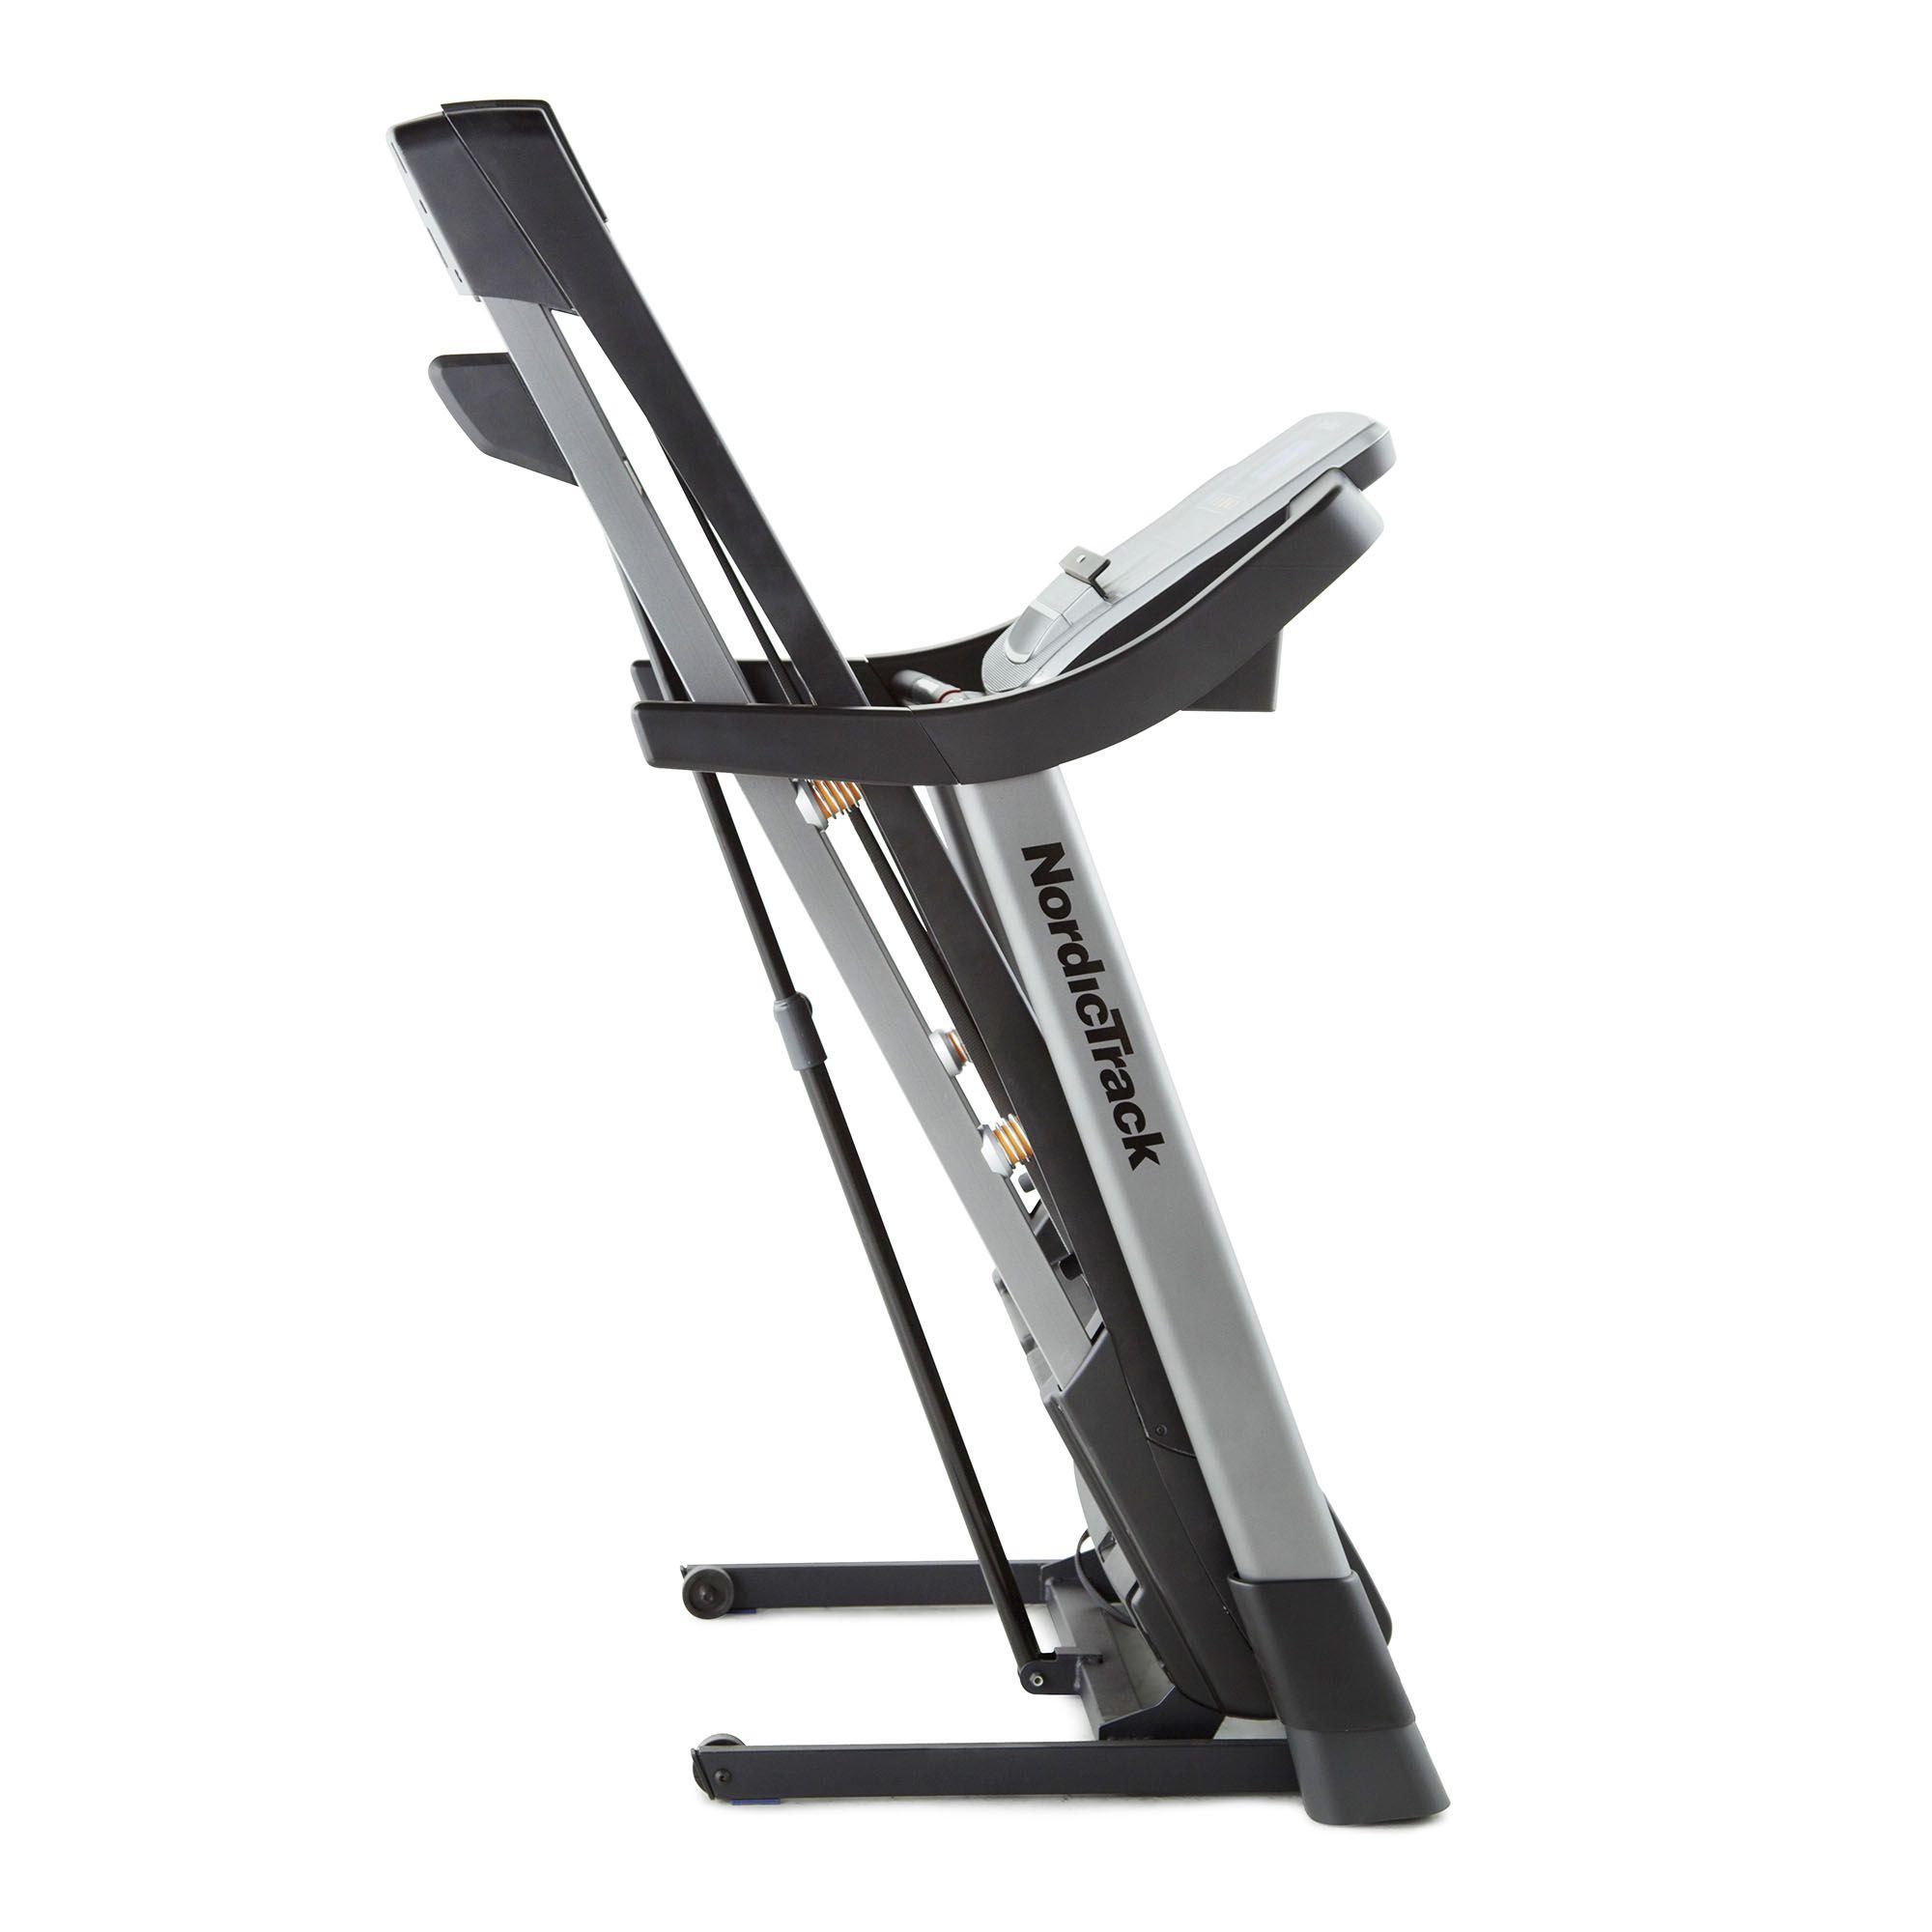 Treadmill Lubricant Nordictrack: NordicTrack T12.2 Treadmill